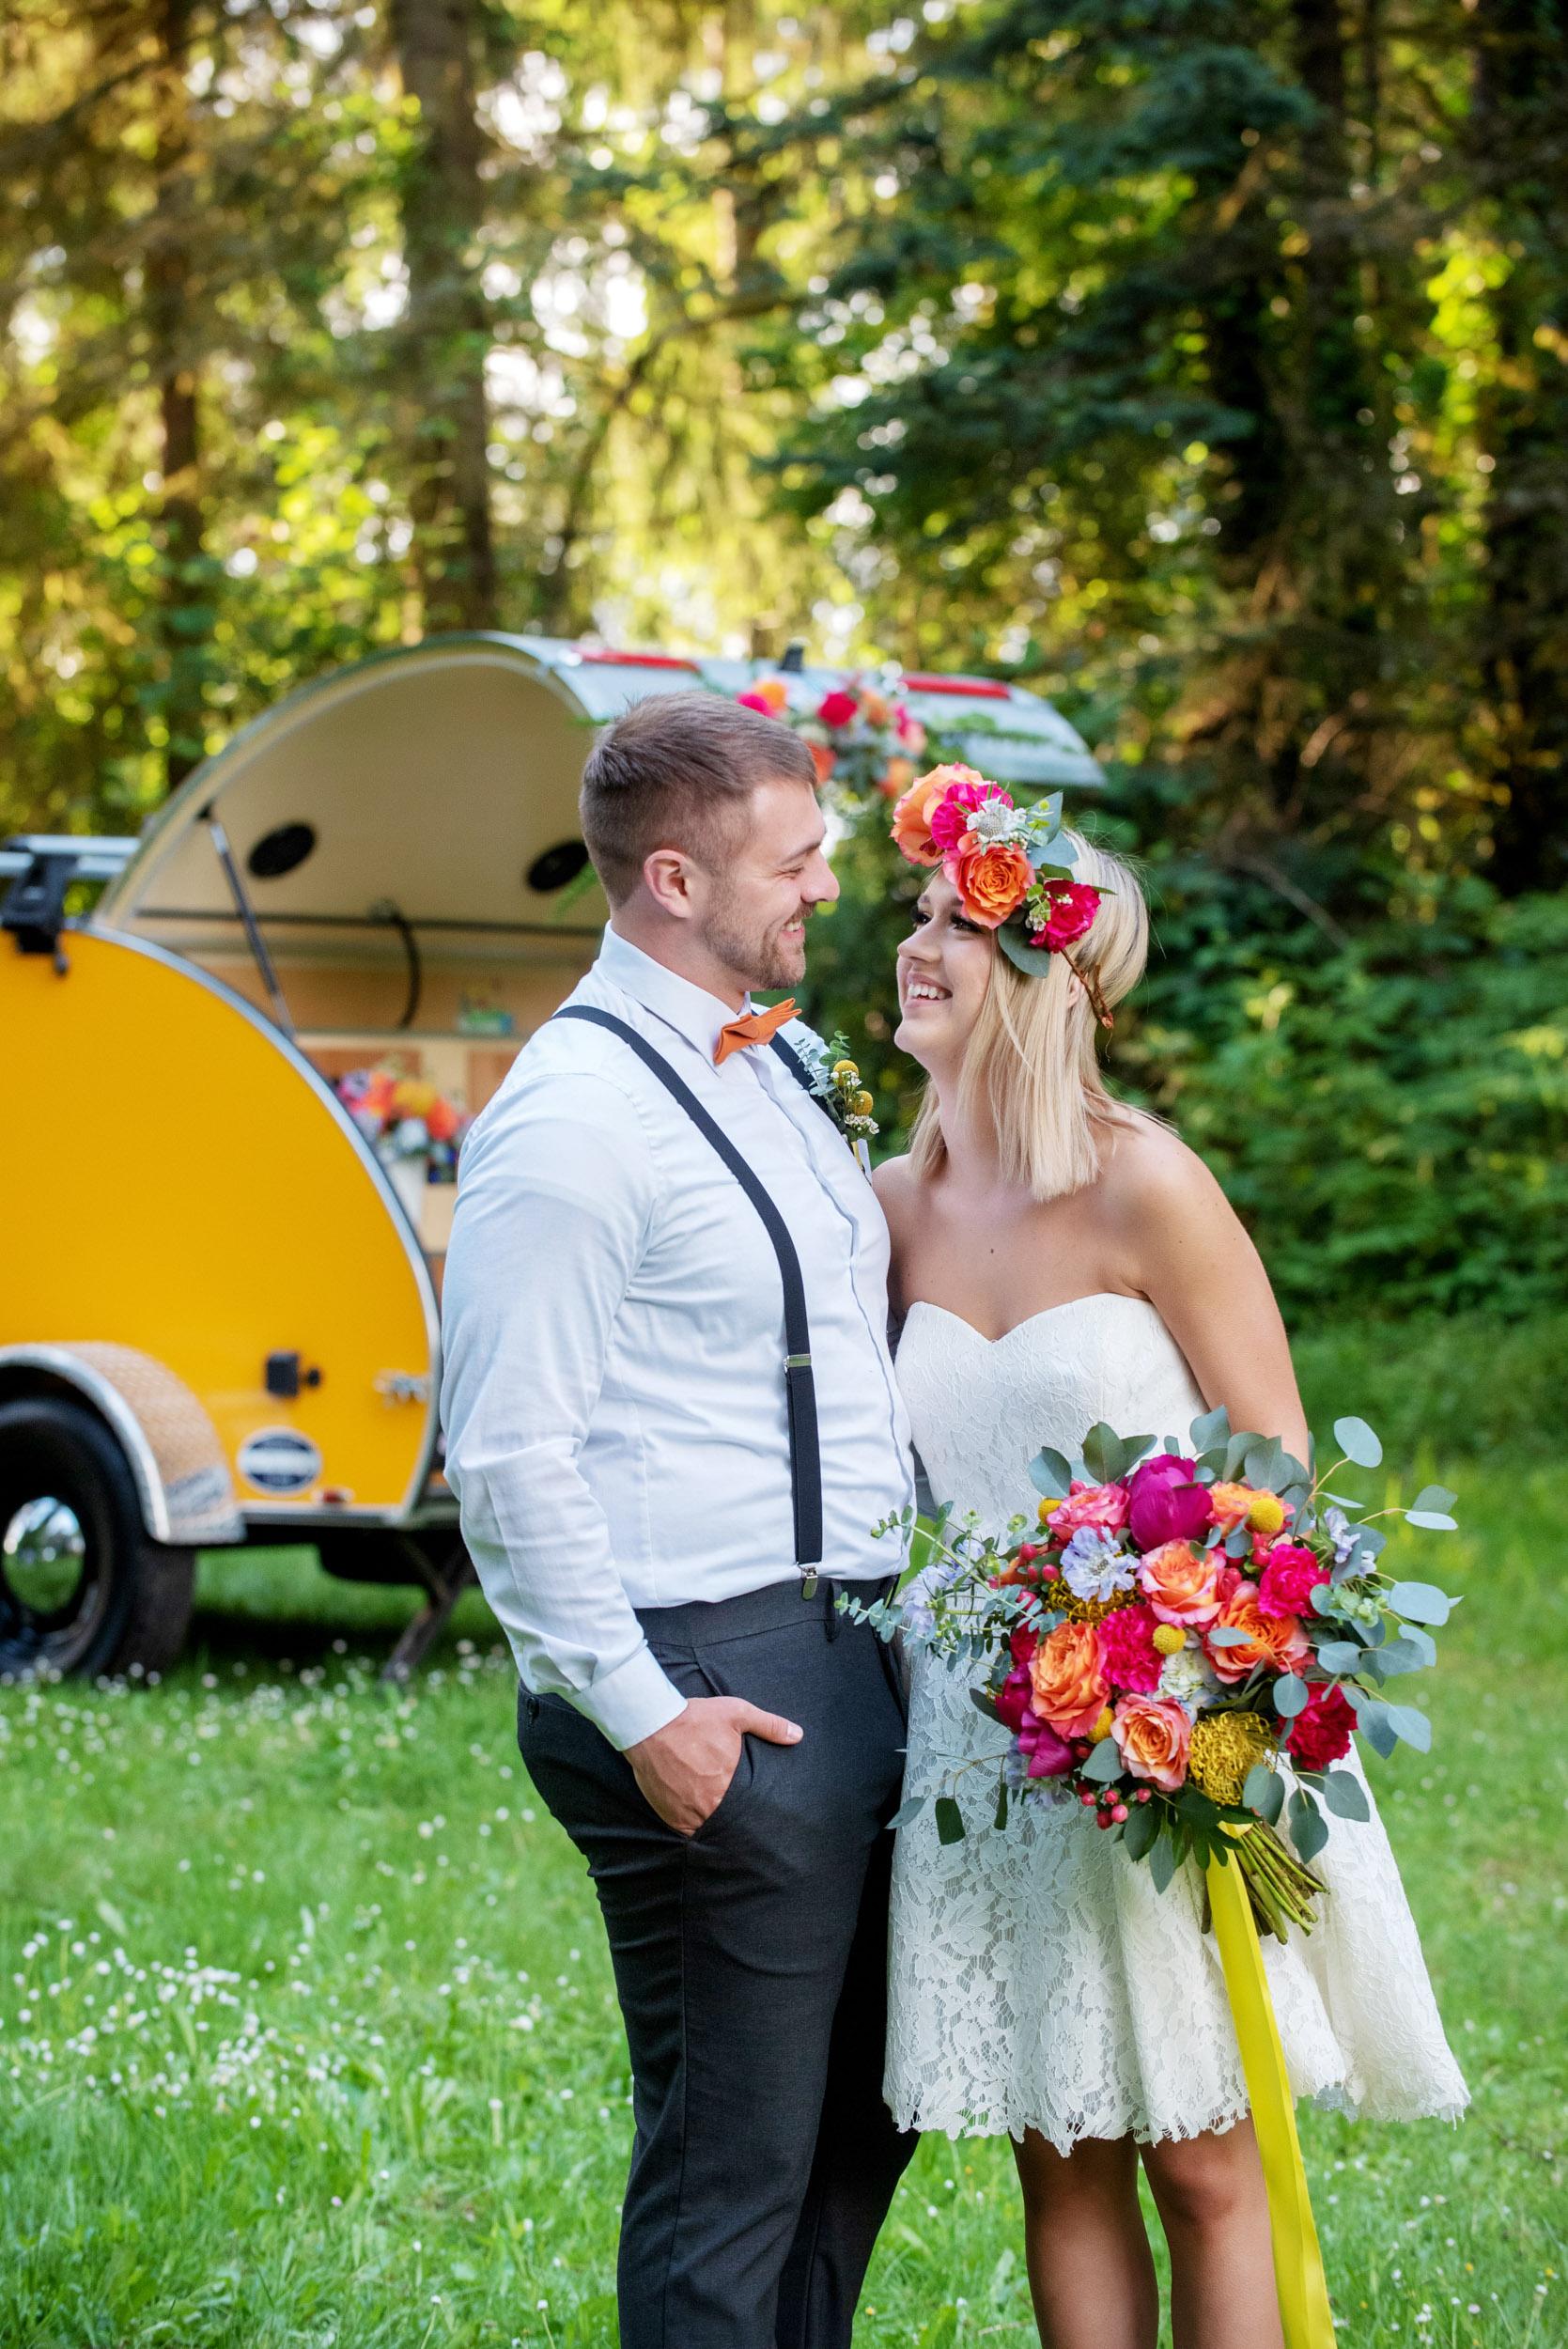 bride and groom, bride bouquet, bridal bouquet, elopement package, oregon elopement wedding, oregon outdoor wedding, oregon outdoor elopement, groom boutonniere, all-inclusive wedding package,